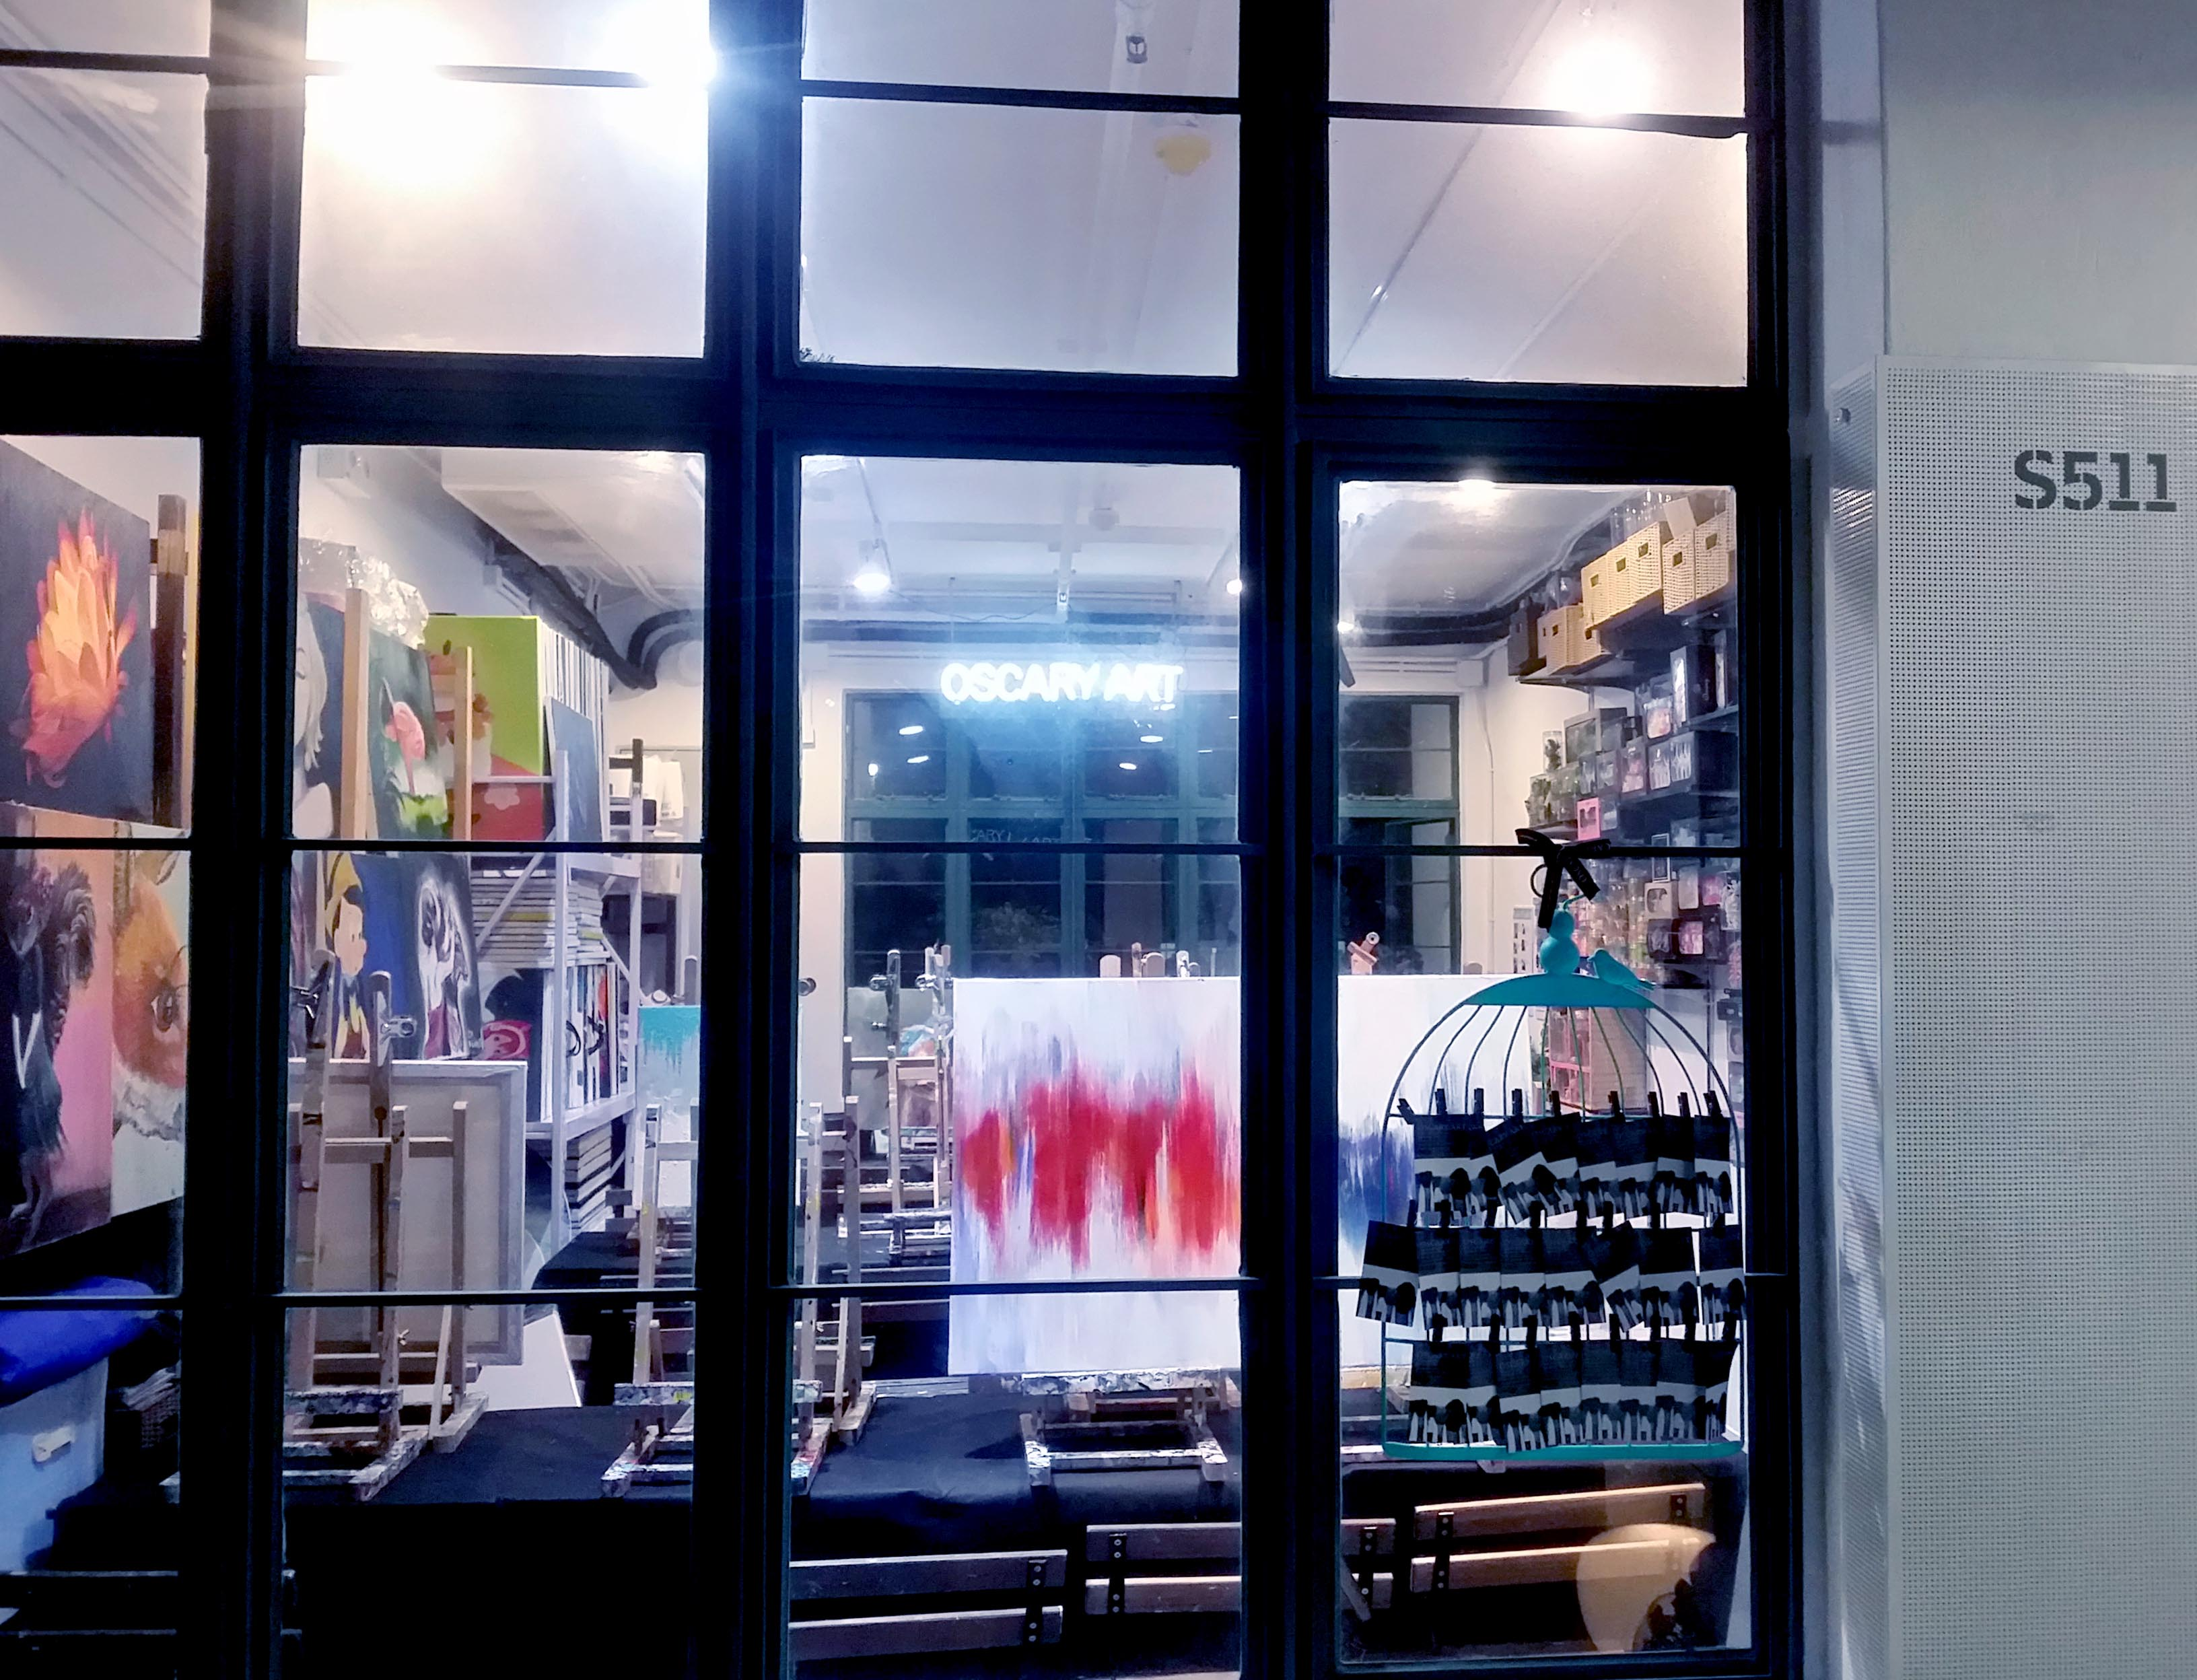 Oscary Art Studio PMQ S511